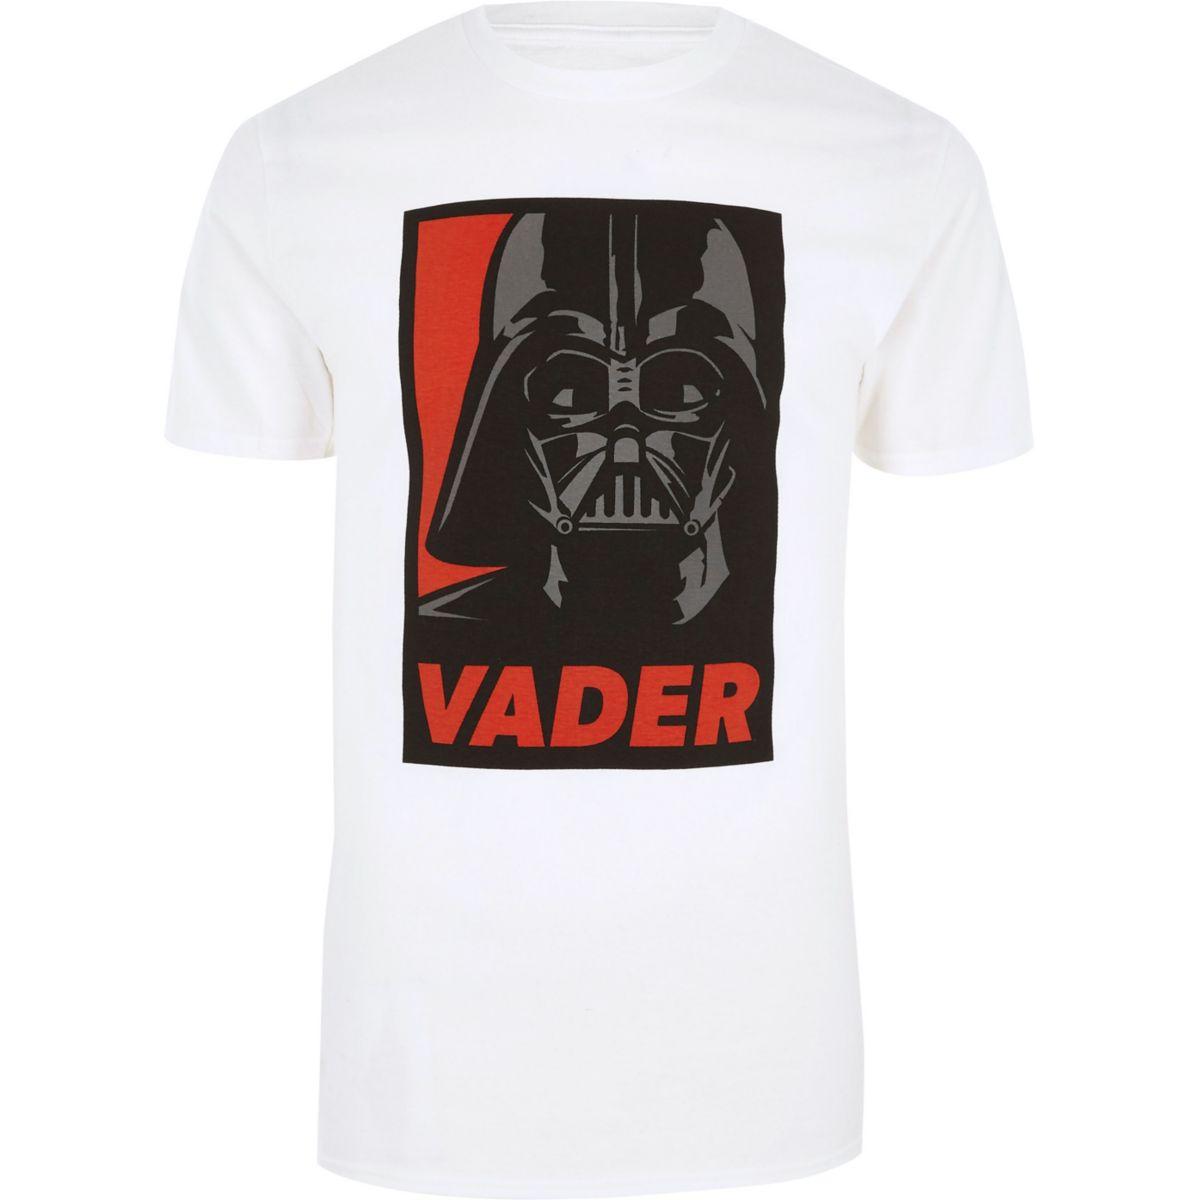 White Star Wars Darth Vader slim fit T-shirt